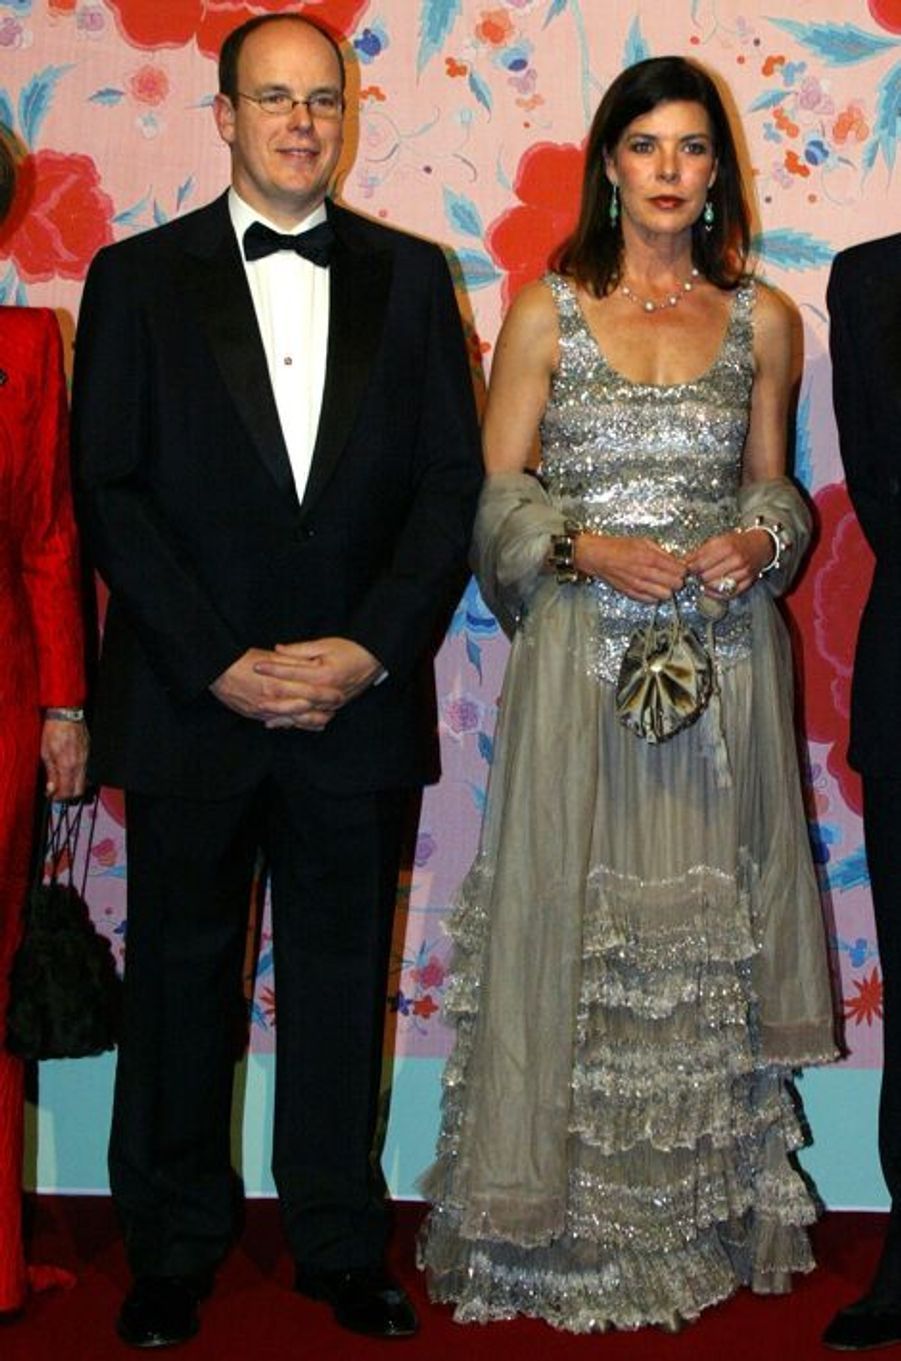 La princesse Caroline de Monaco au bal de la Rose 2004, avec le prince Albert